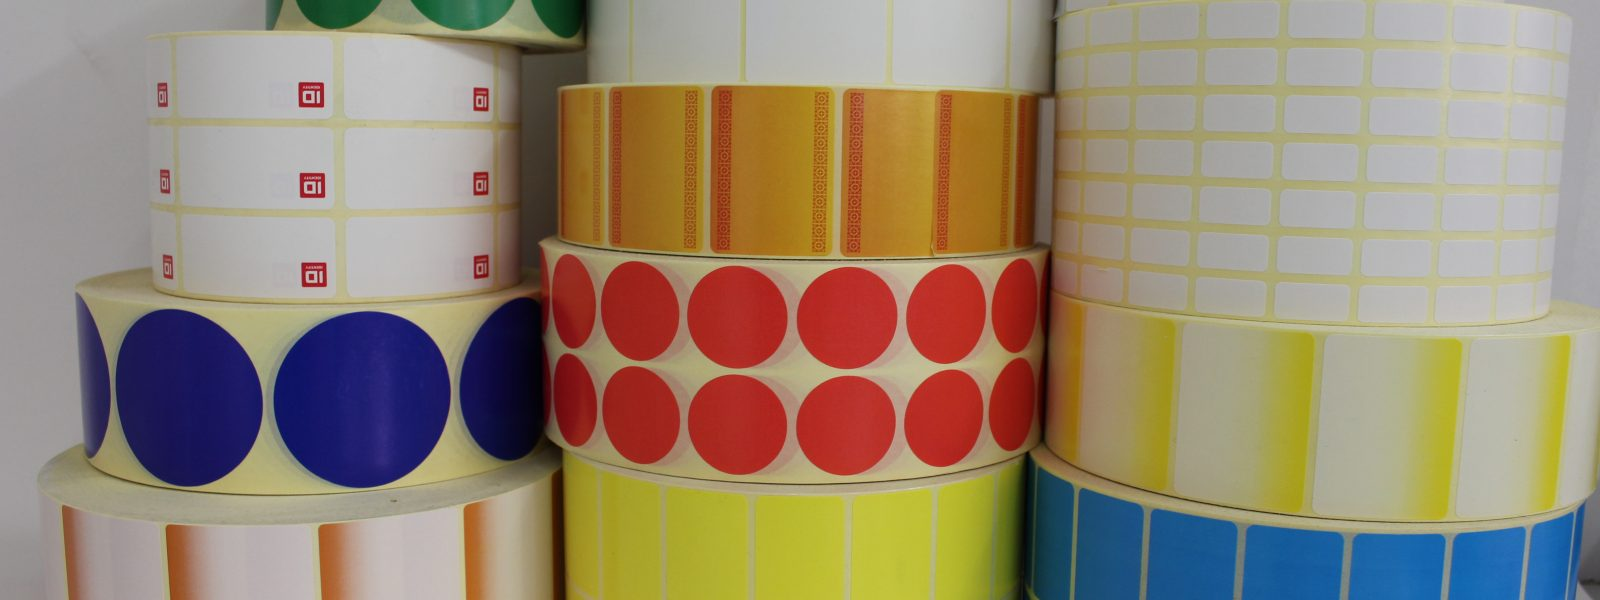 етикети флексопечат